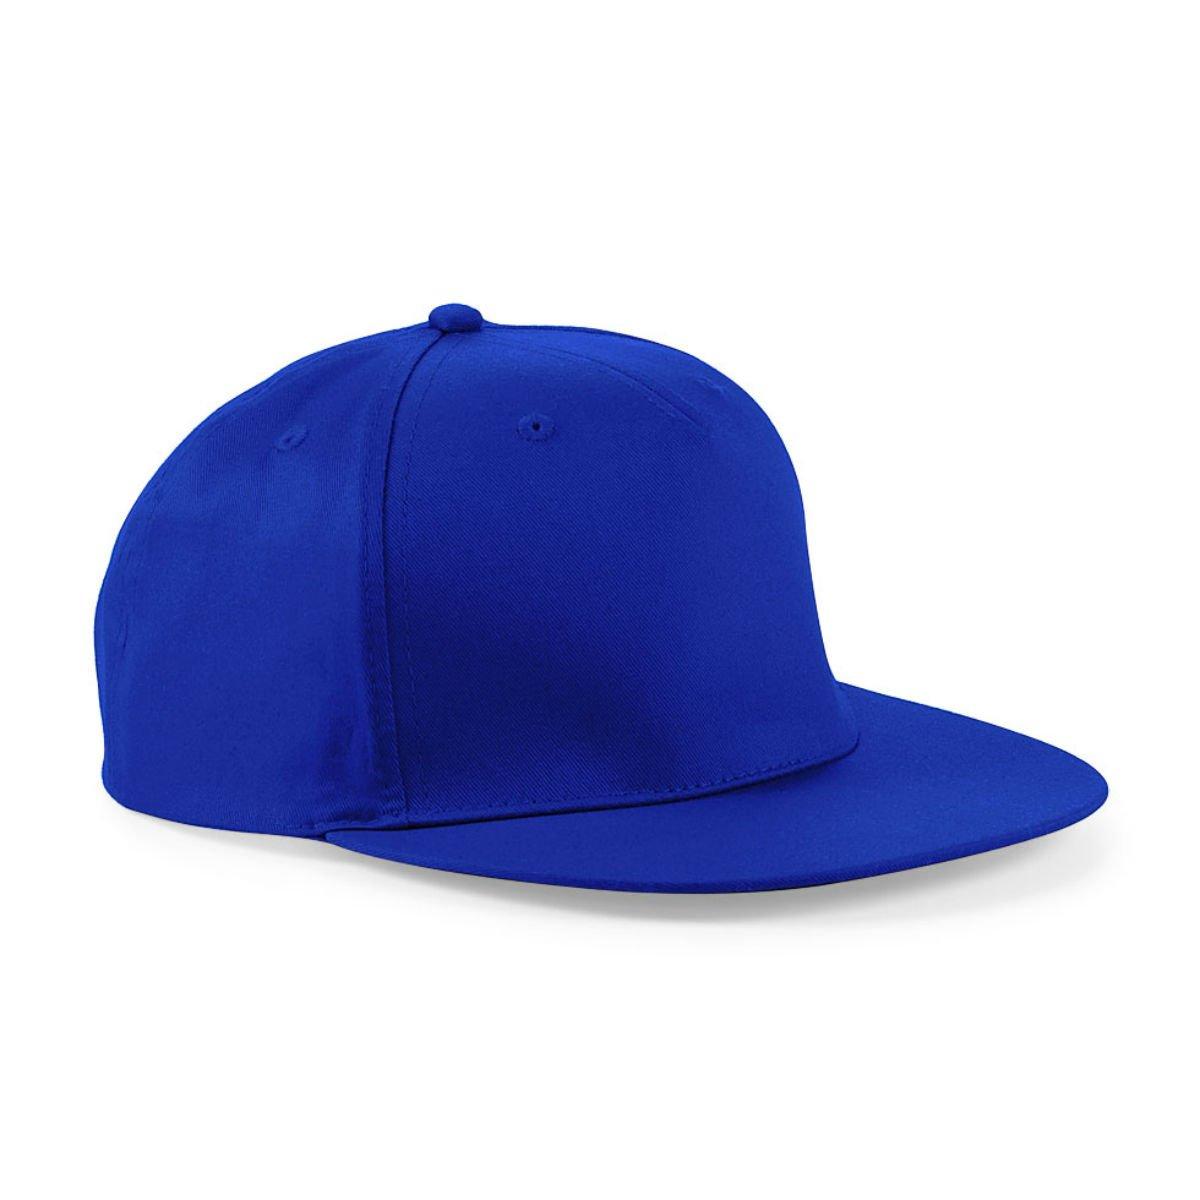 Beechfield Rapper Cap, verschiedene Farben one size,Königsblau